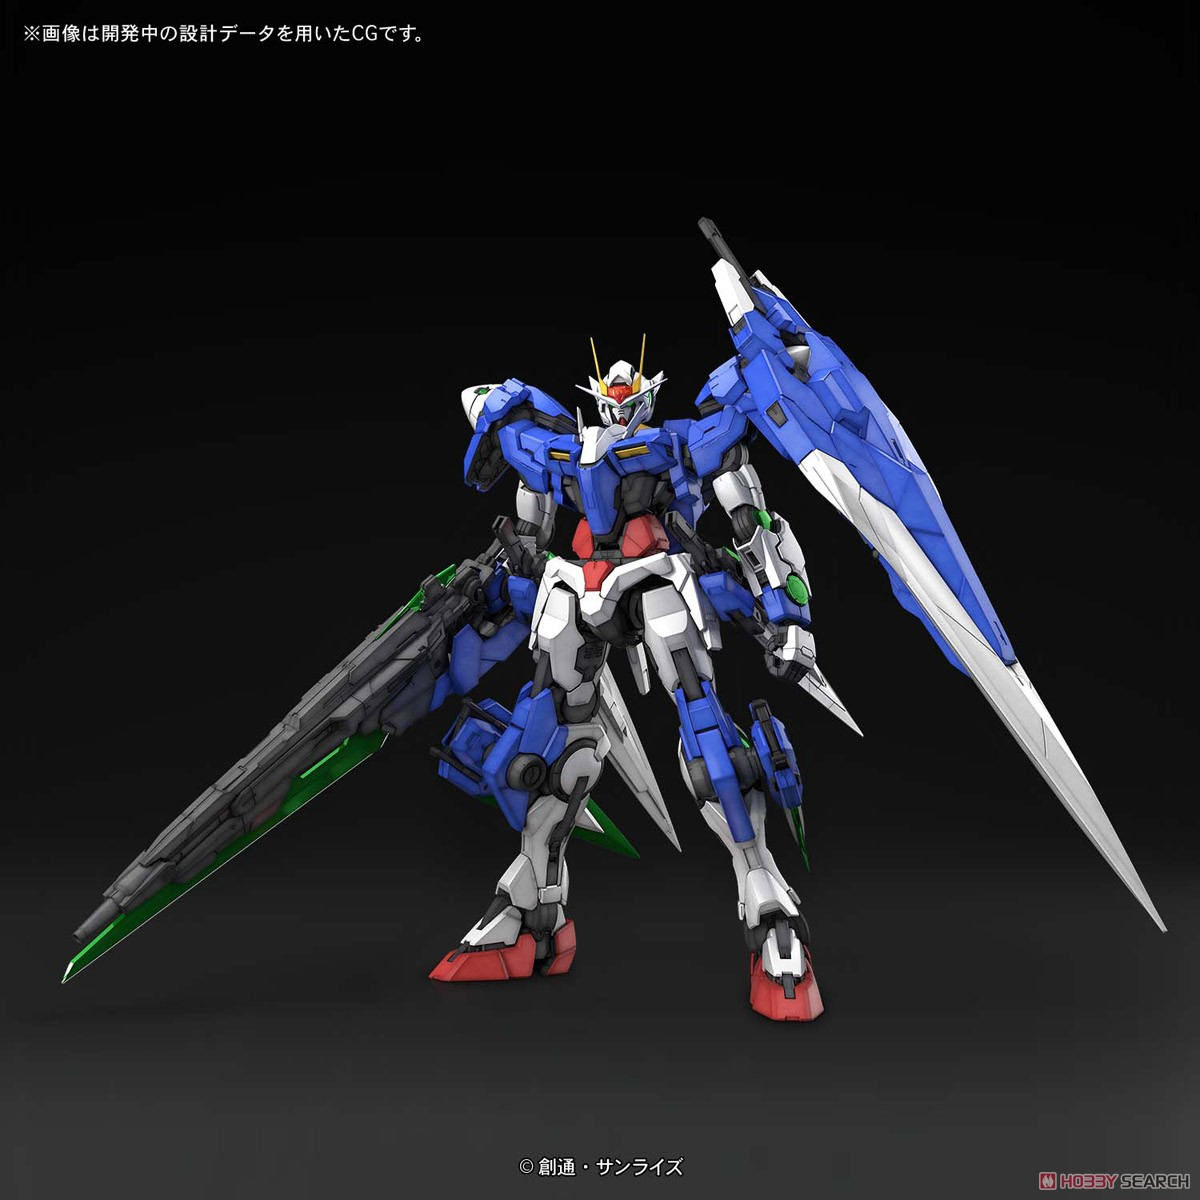 00 Gundam Seven Sword/G (PG) (Gundam Model Kits) Other picture1